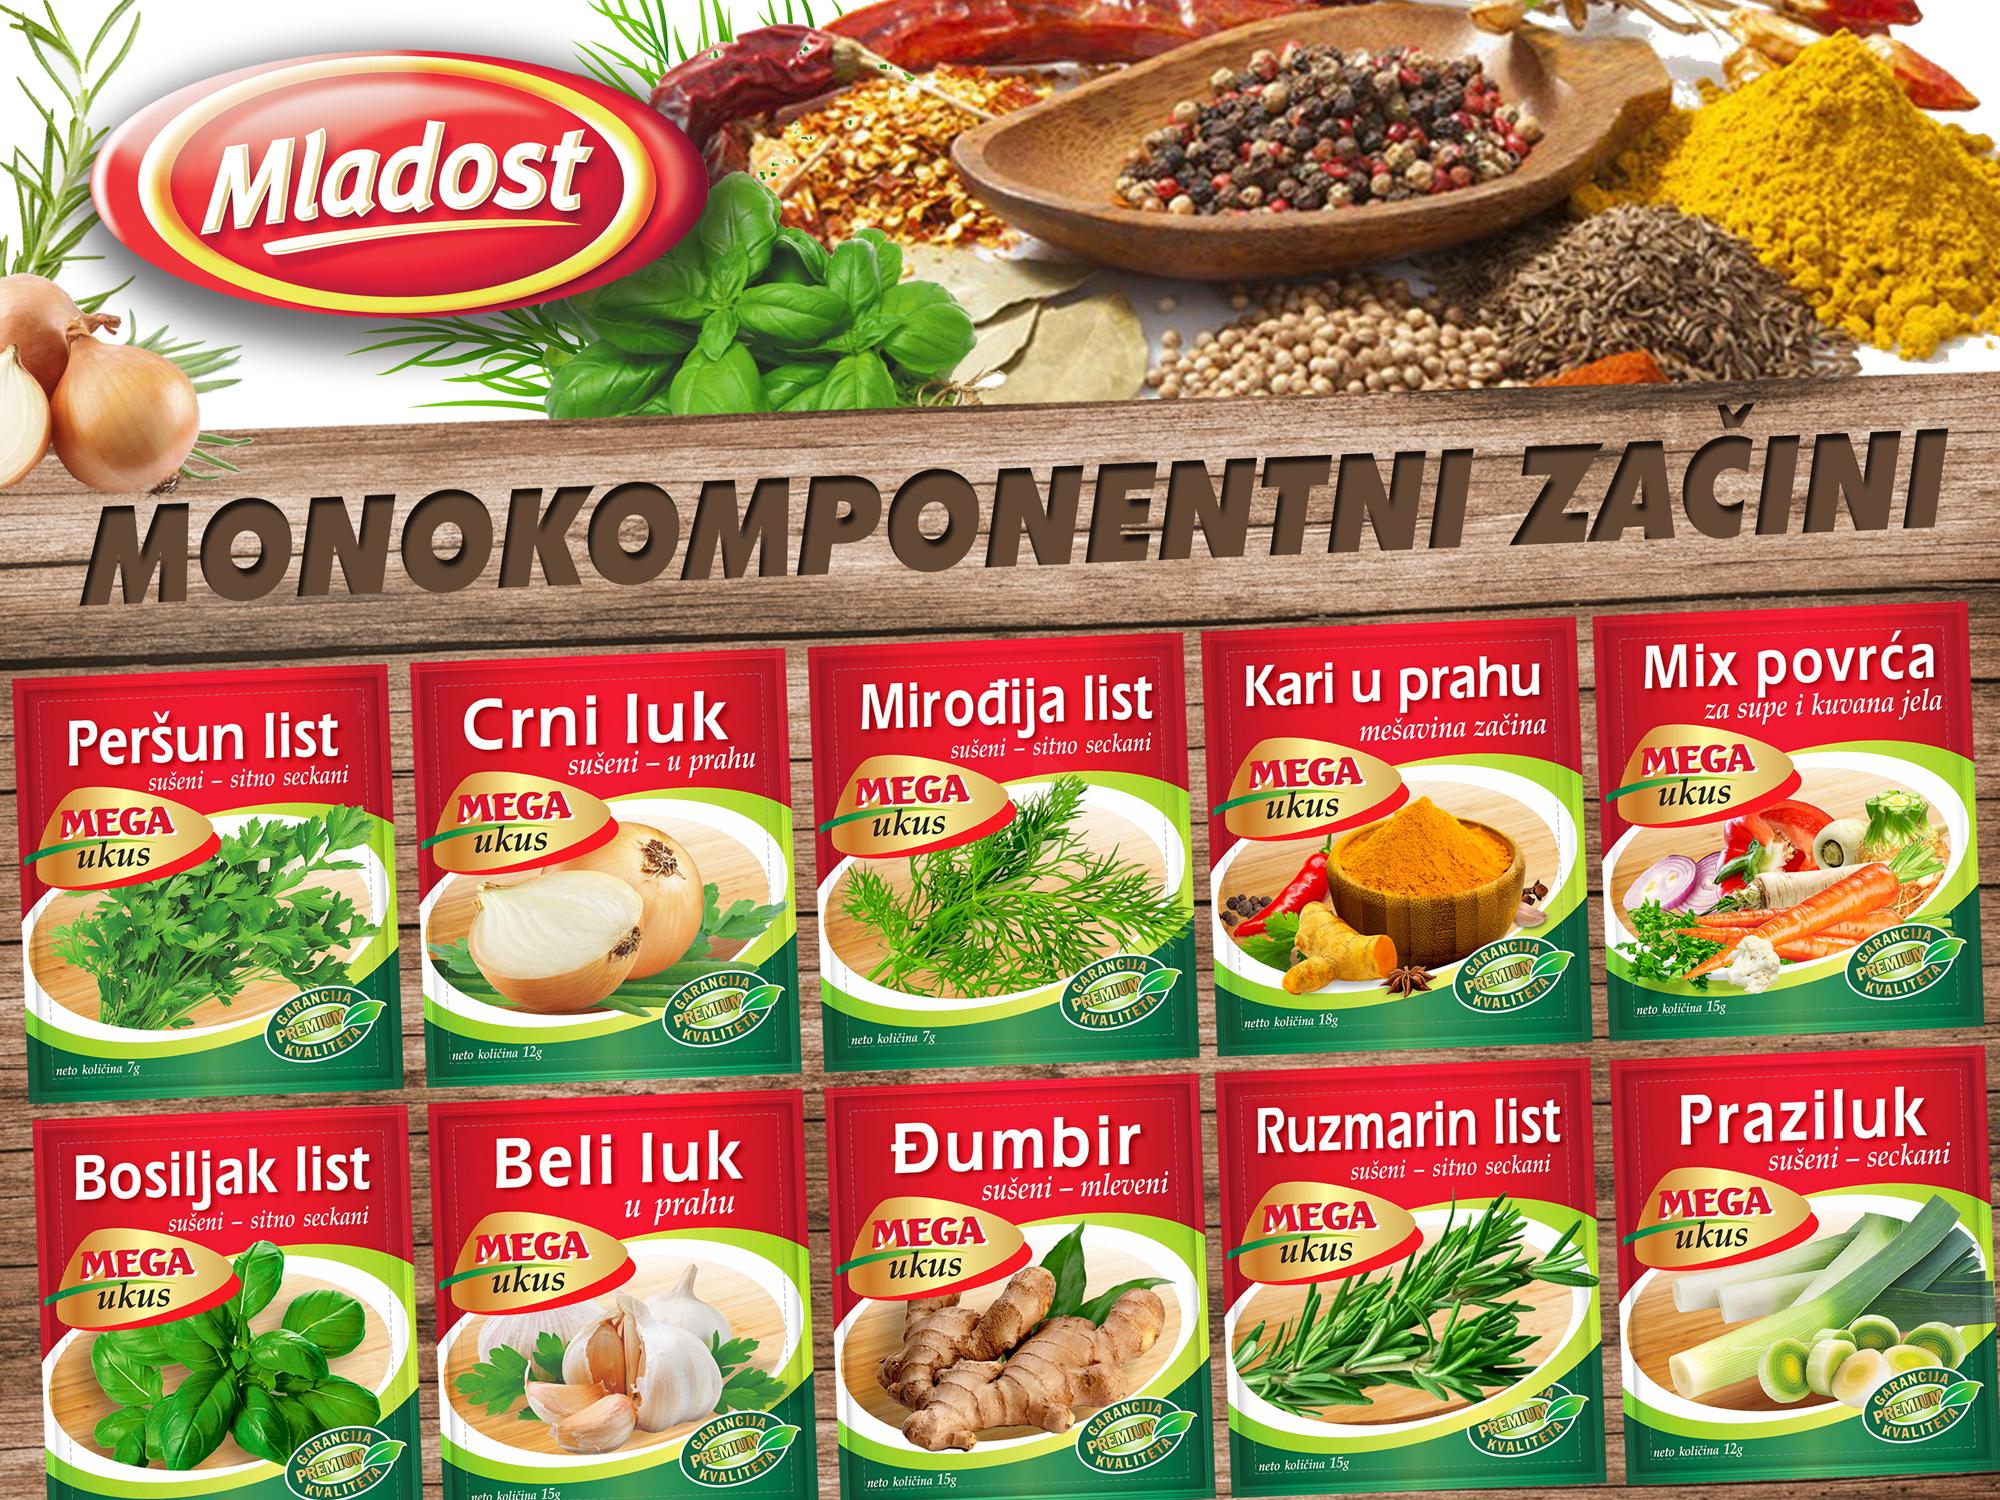 monokomponentni_zacini_suseni_i_sitno_seckani_proizvodjac_mladost_leskovac